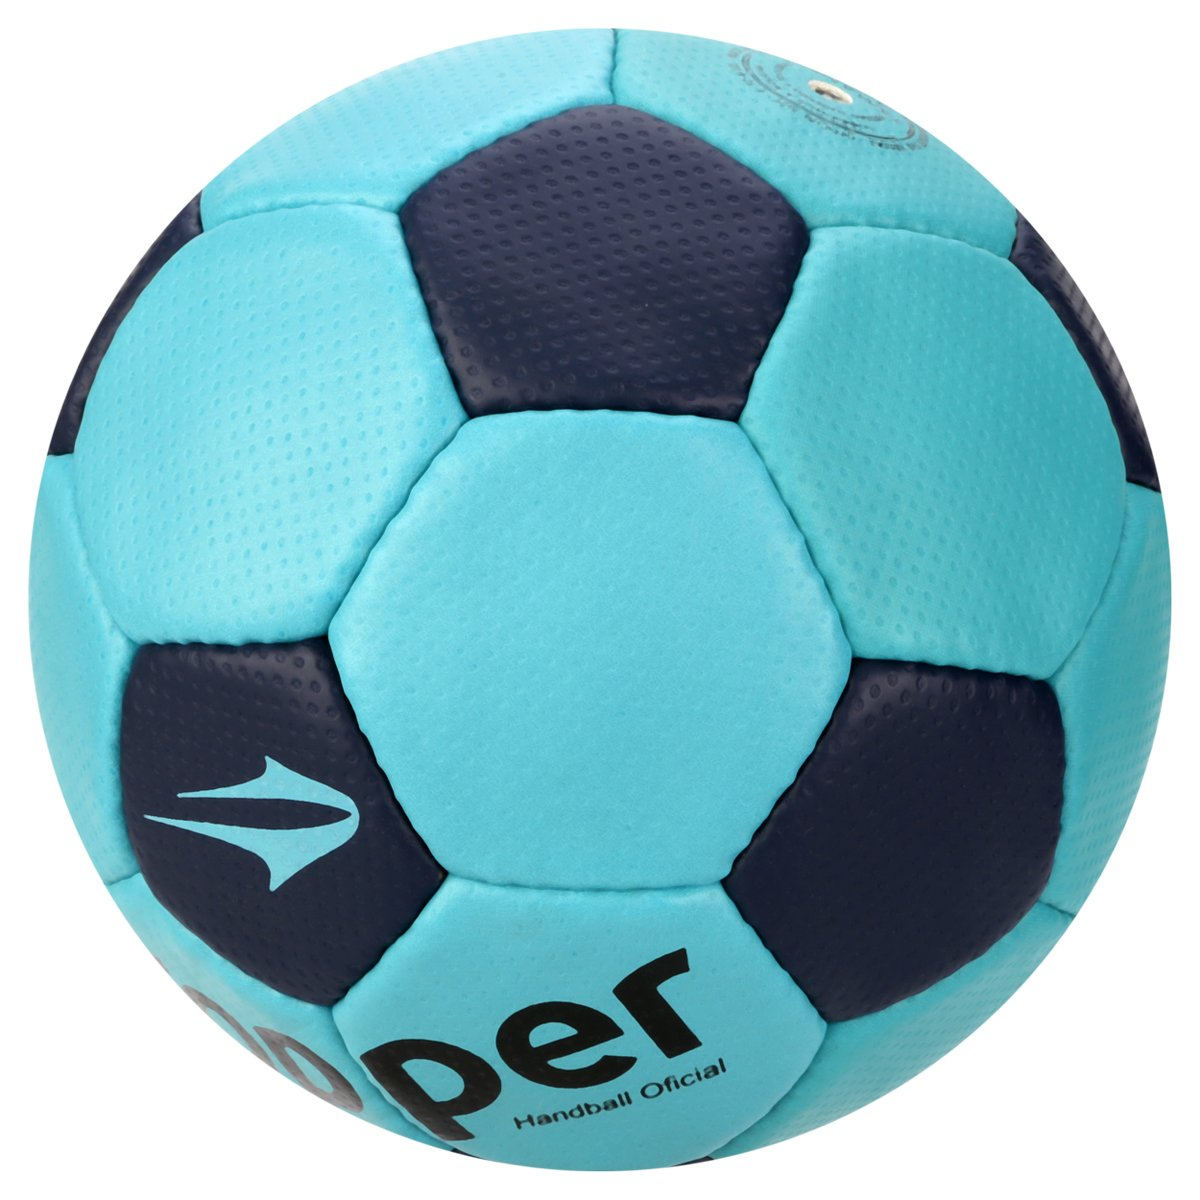 1a26f1be84 Bola de Handebol Topper Oficial C C - Compre Agora